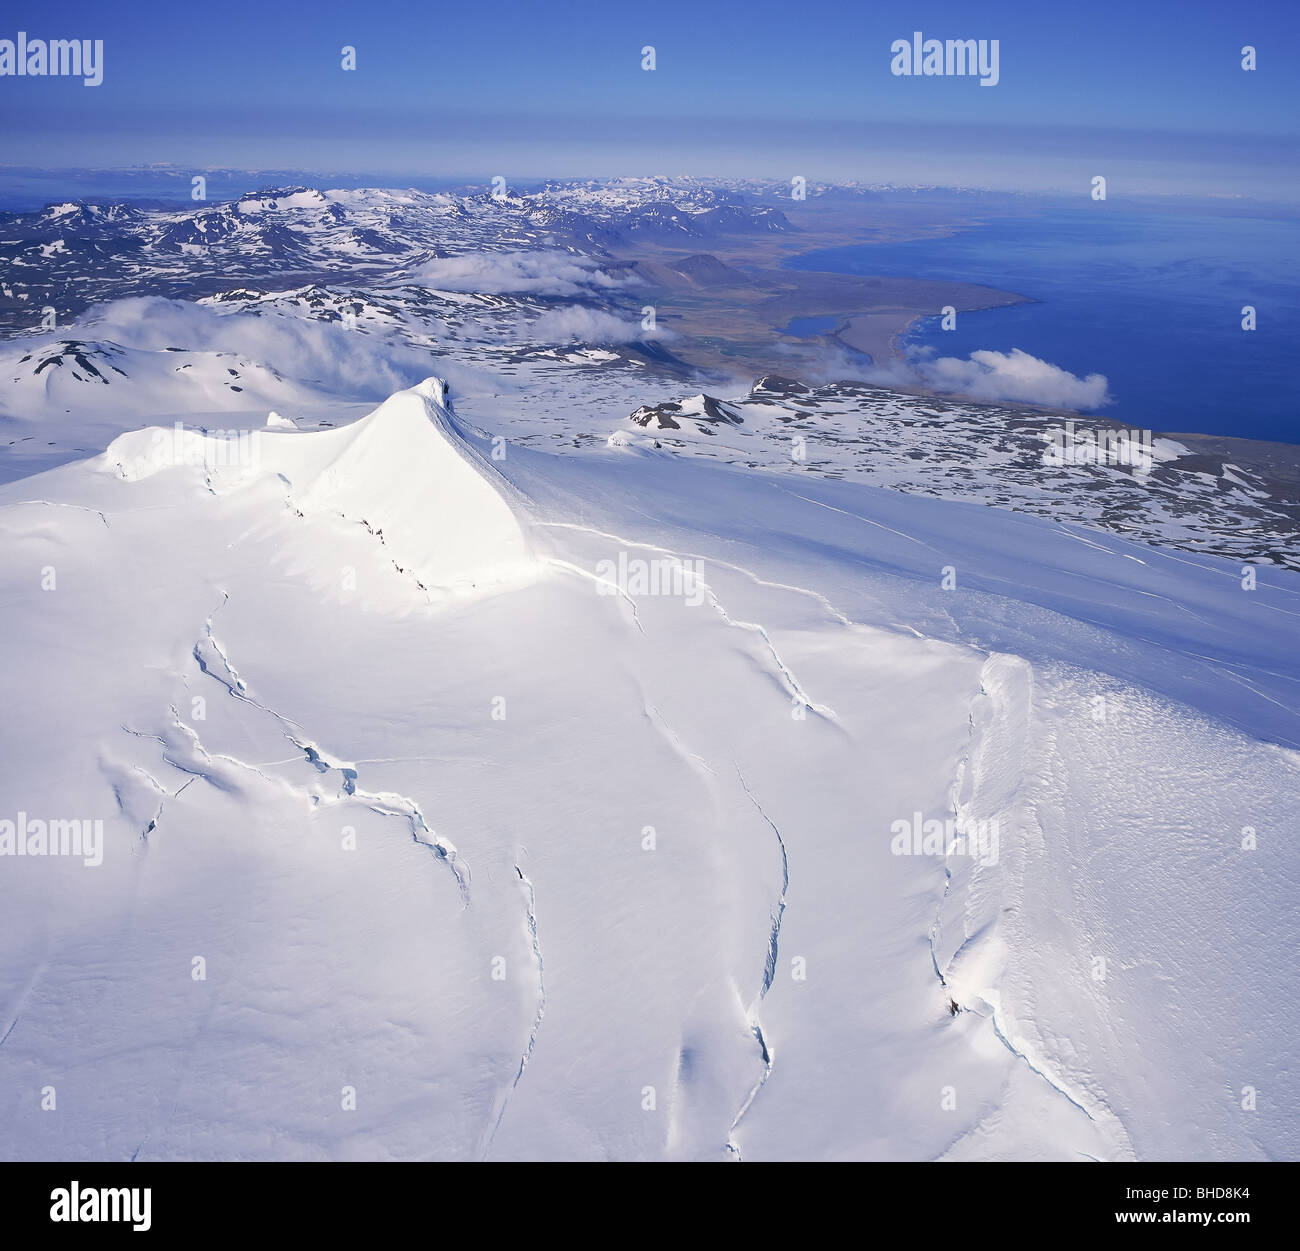 Snaefellsjokull glacier, Snaefellsnes Peninsula - Stock Image